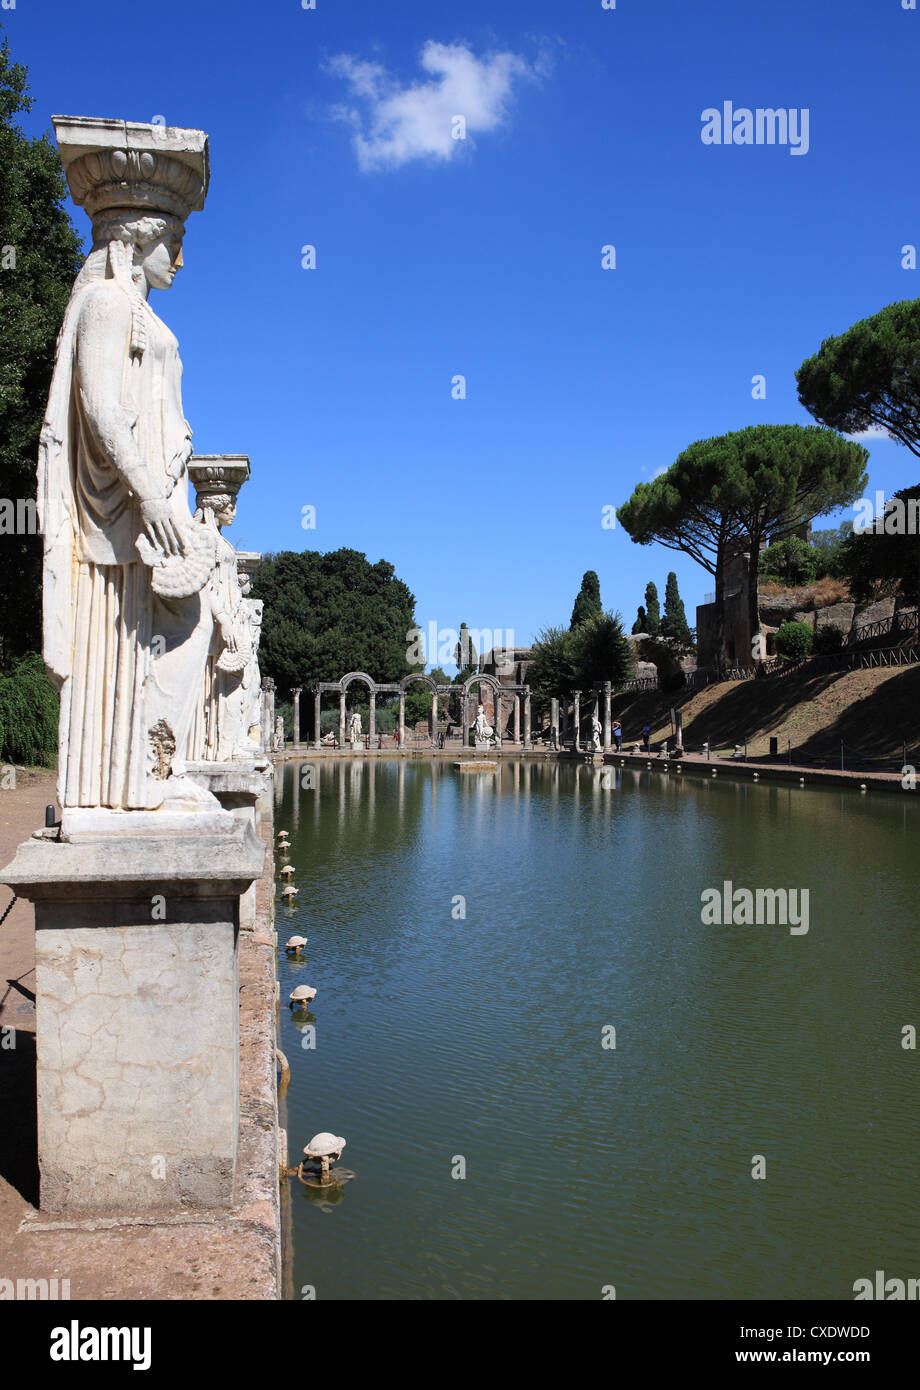 Hadrian's Villa, Canopus Canal, UNESCO World Heritage Site, Tivoli, Rome, Lazio, Italy, Europe - Stock Image